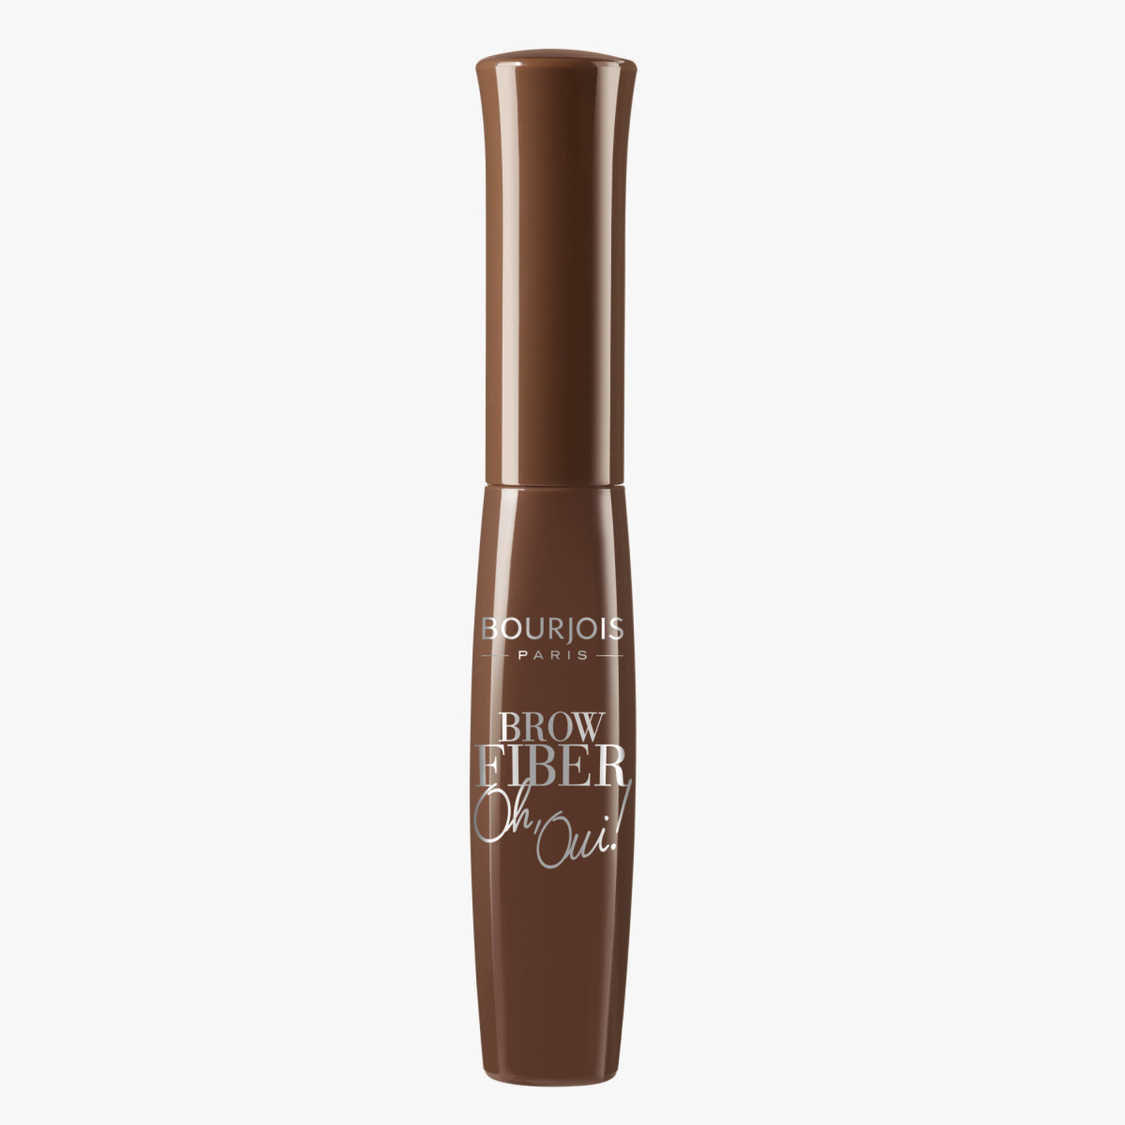 Bourjois Oh Oui Brow Fiber - 6.8 ml